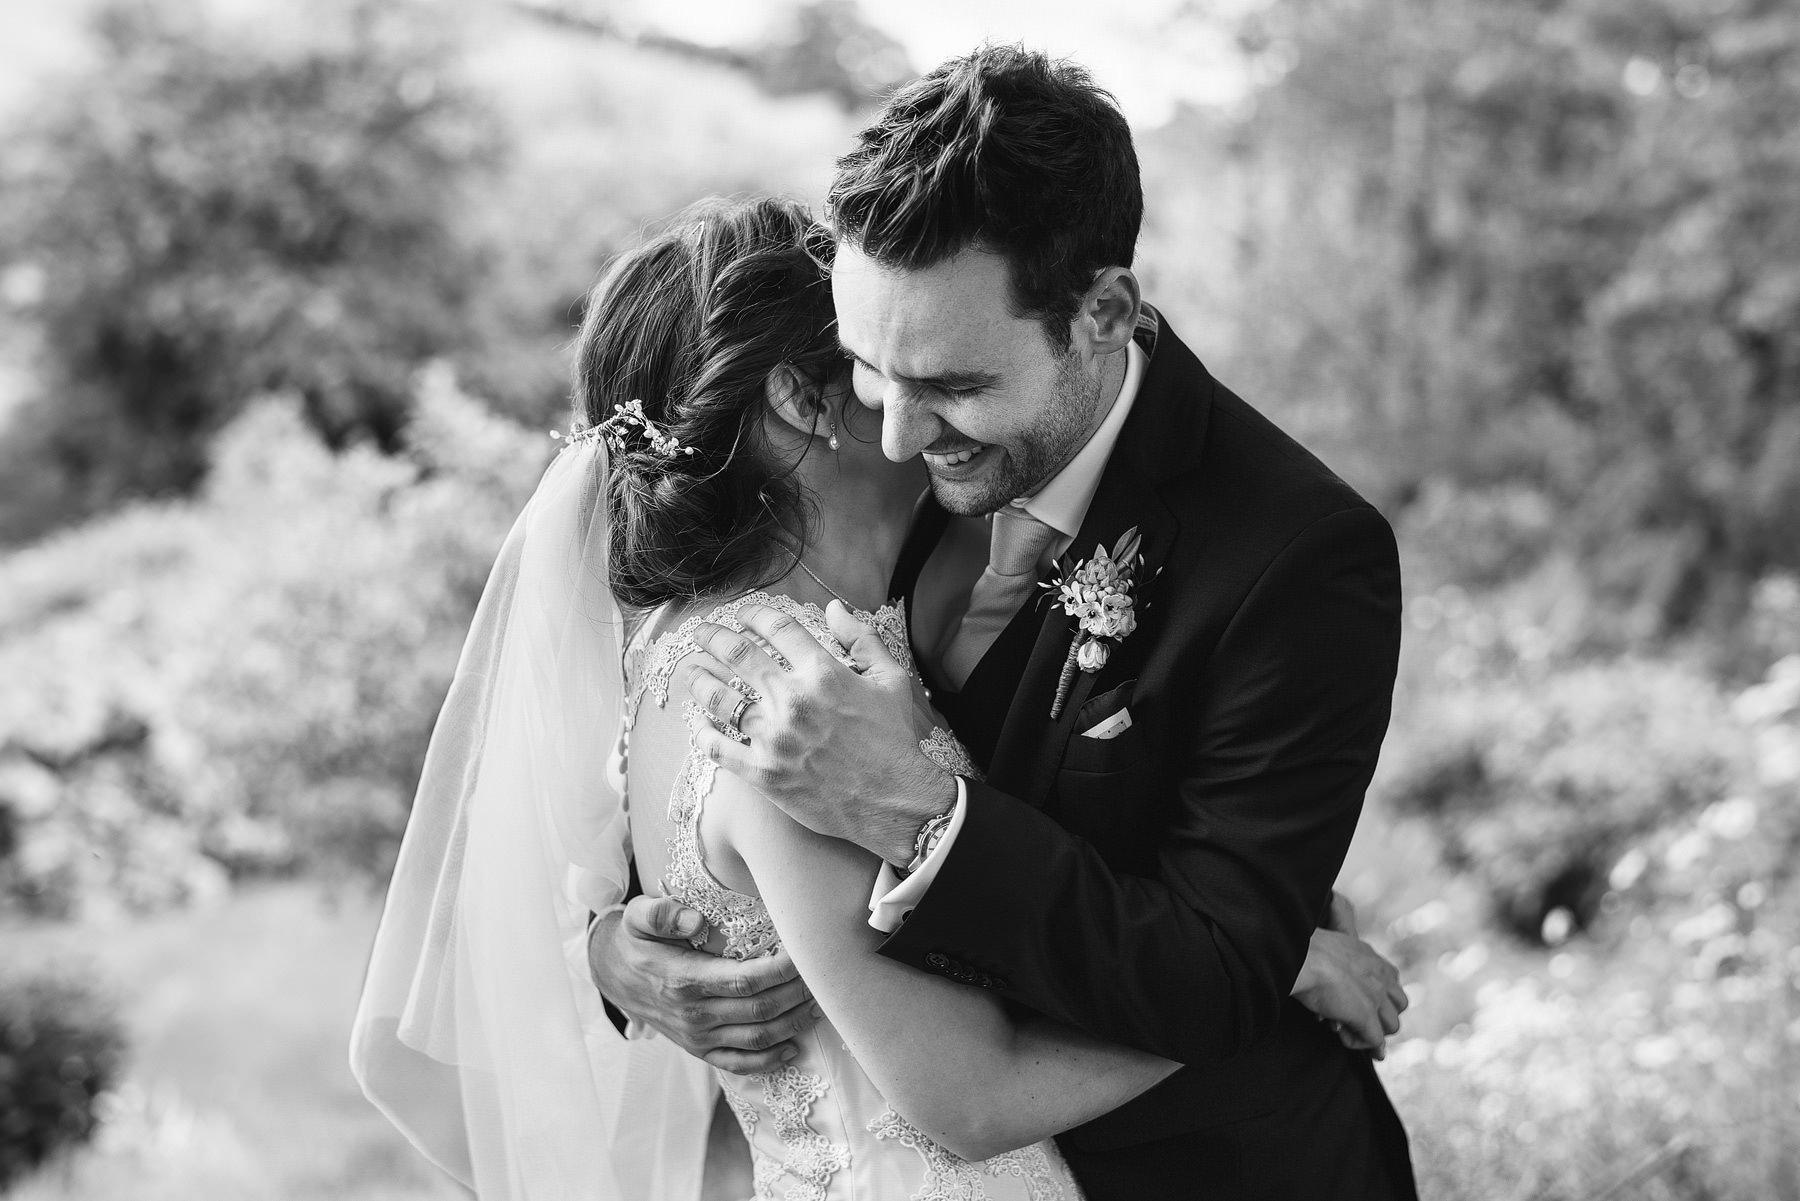 best wedding photographers 2018